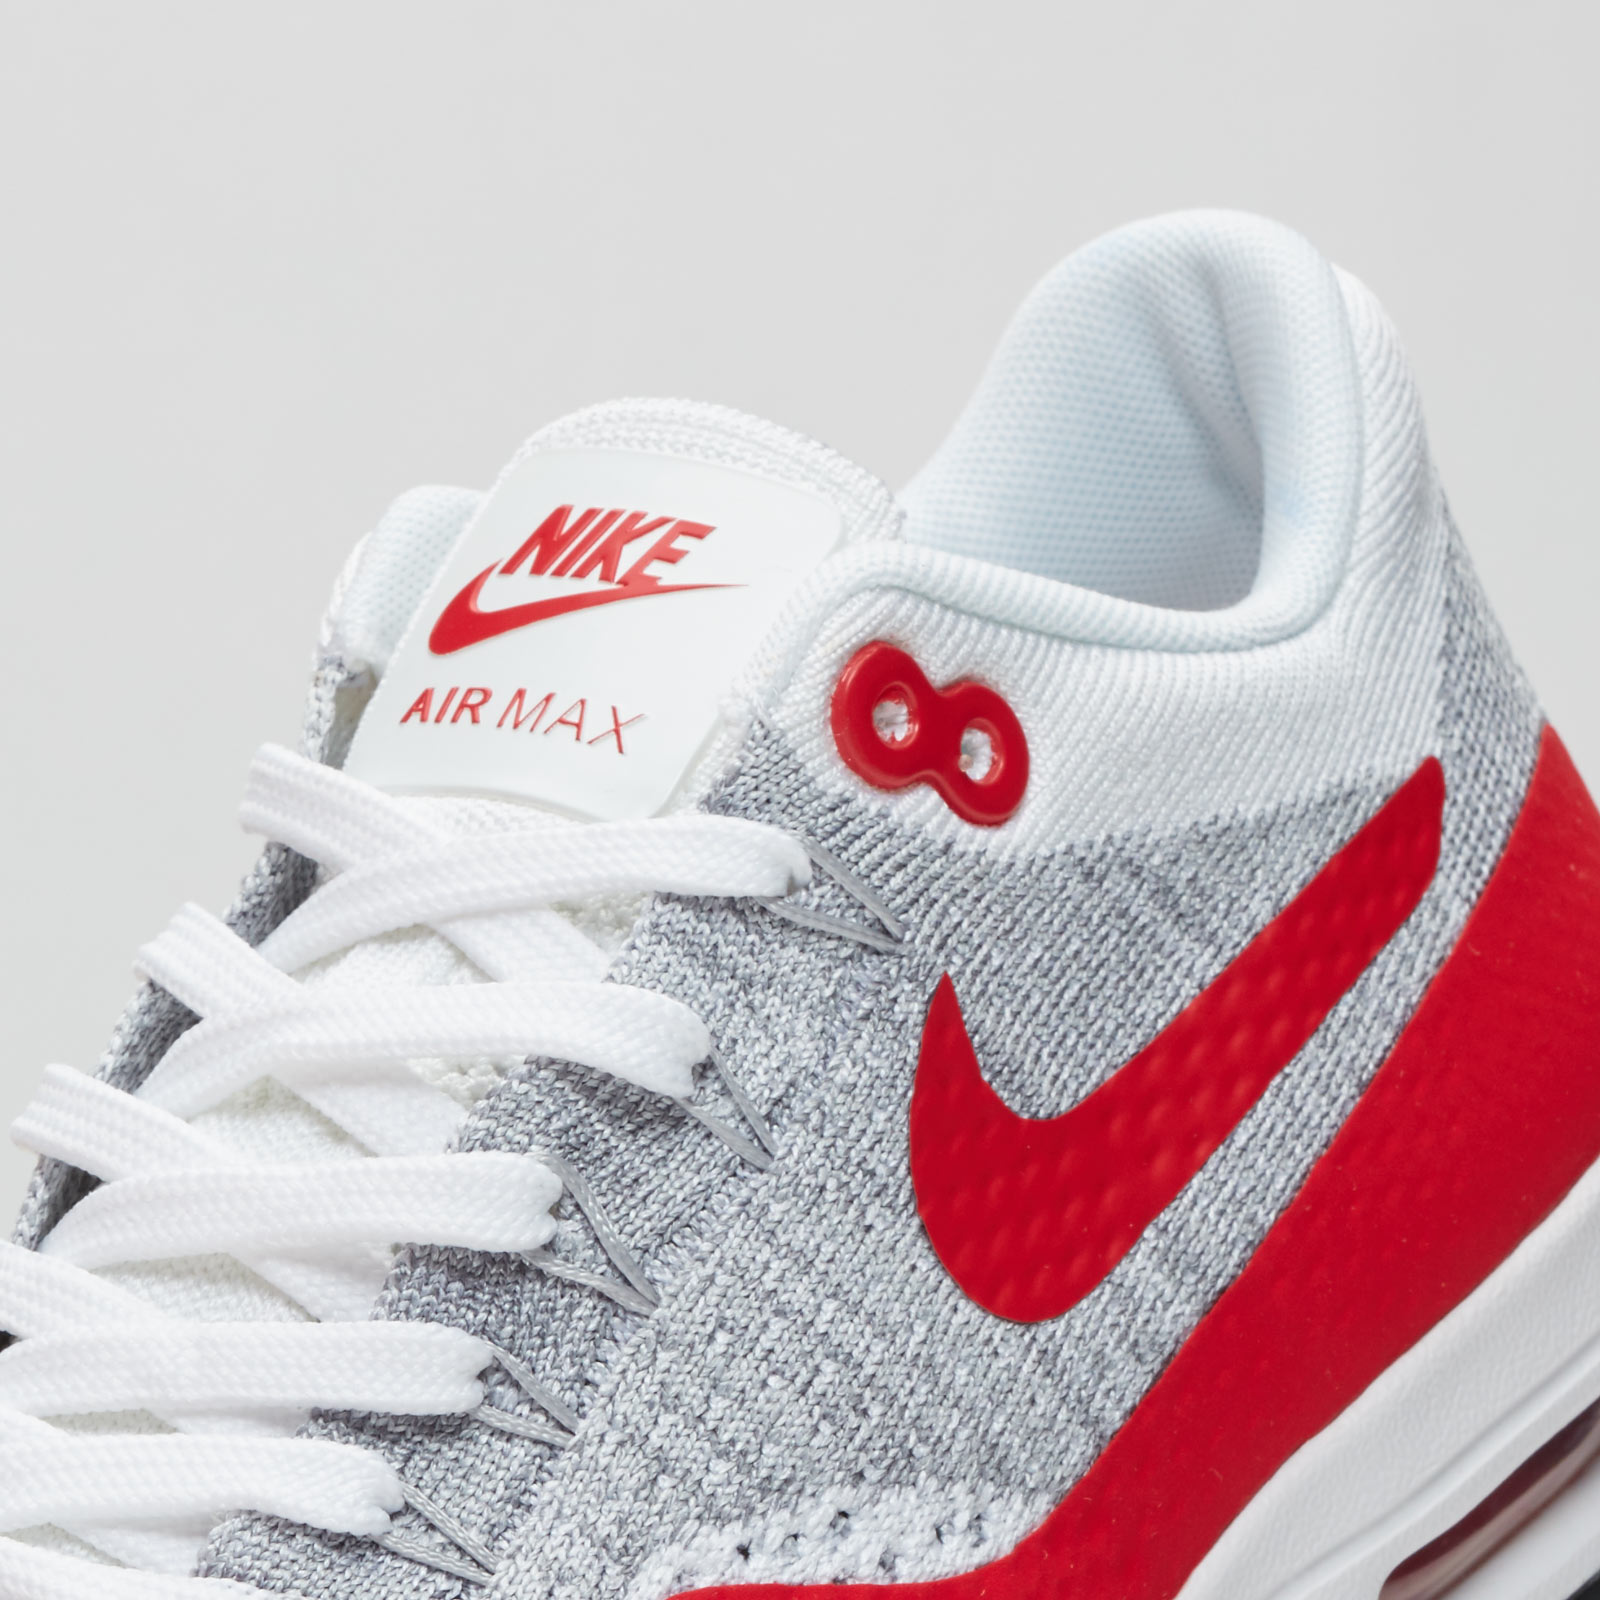 Nike W Air Max 1 Ultra Flyknit - 843387-101 - Sneakersnstuff ... cb8e3c449